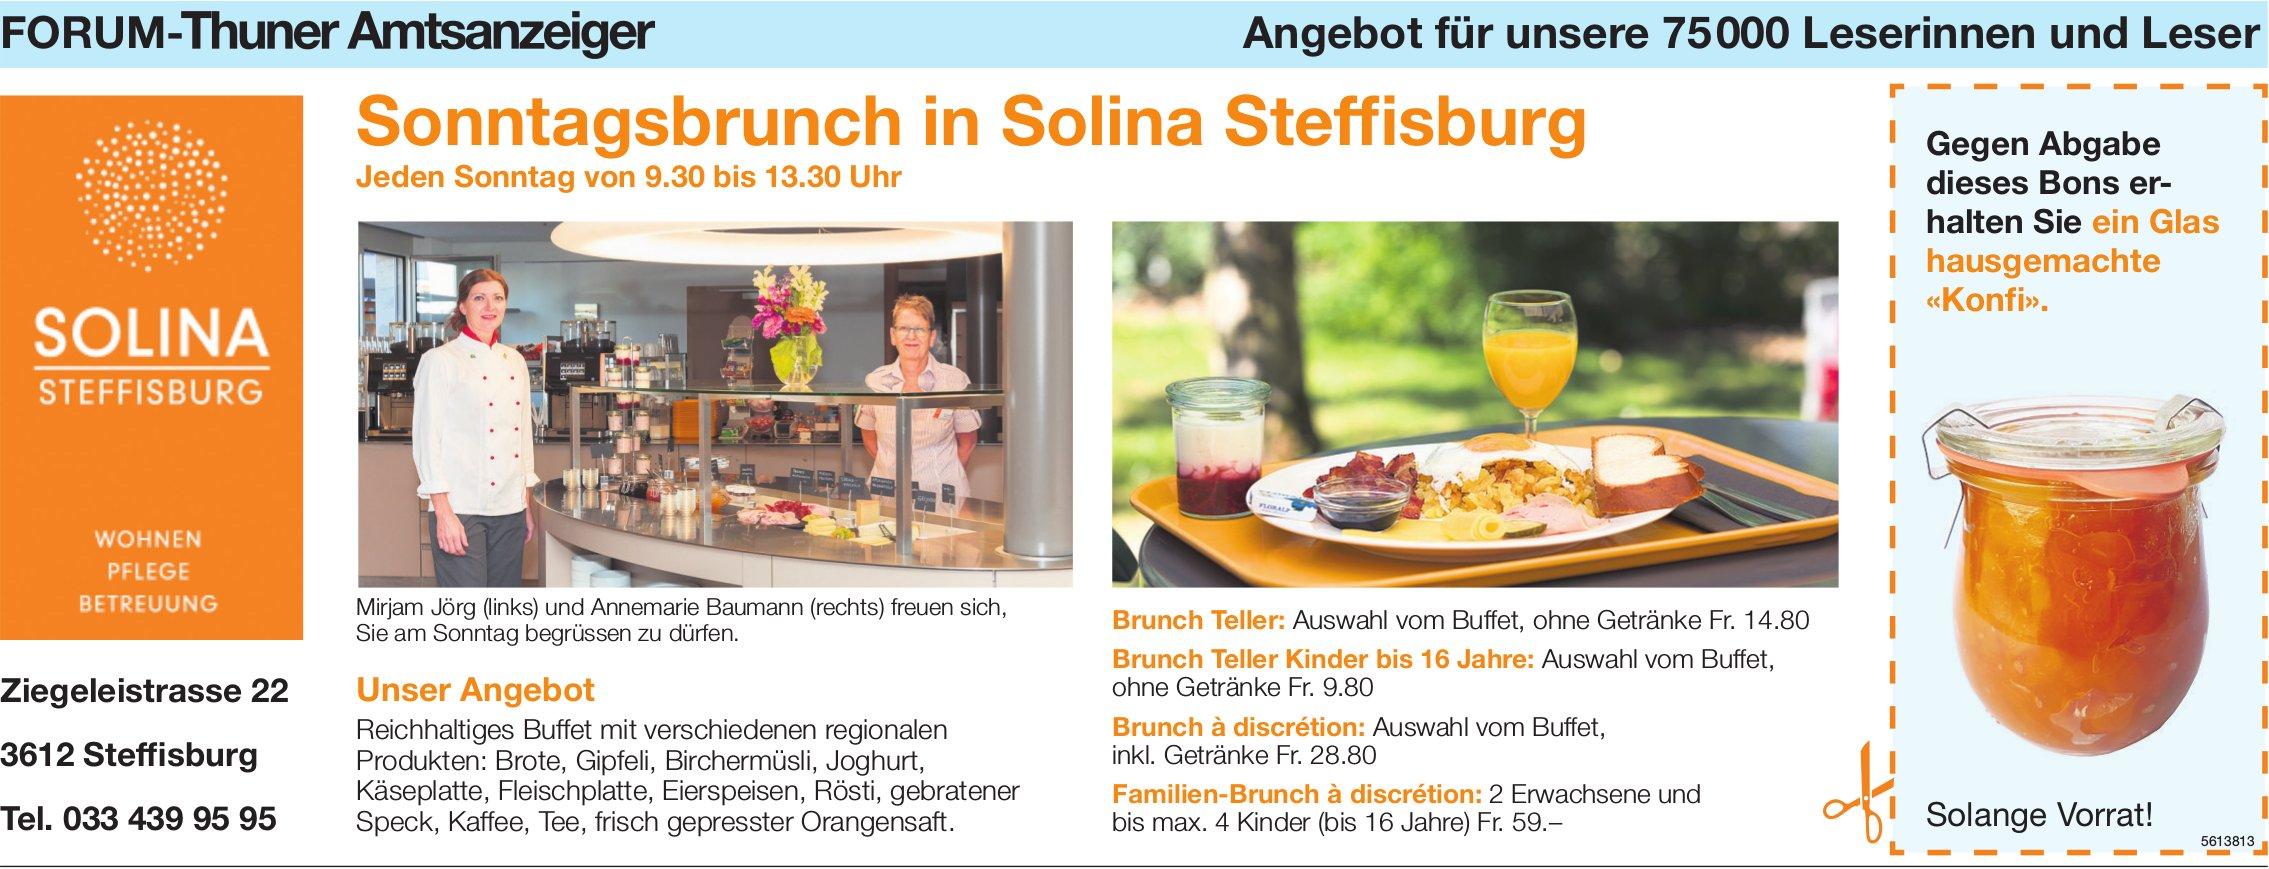 Forum-Thuner Amtsanzeiger - Sonntagsbrunch in Solina Steffisburg